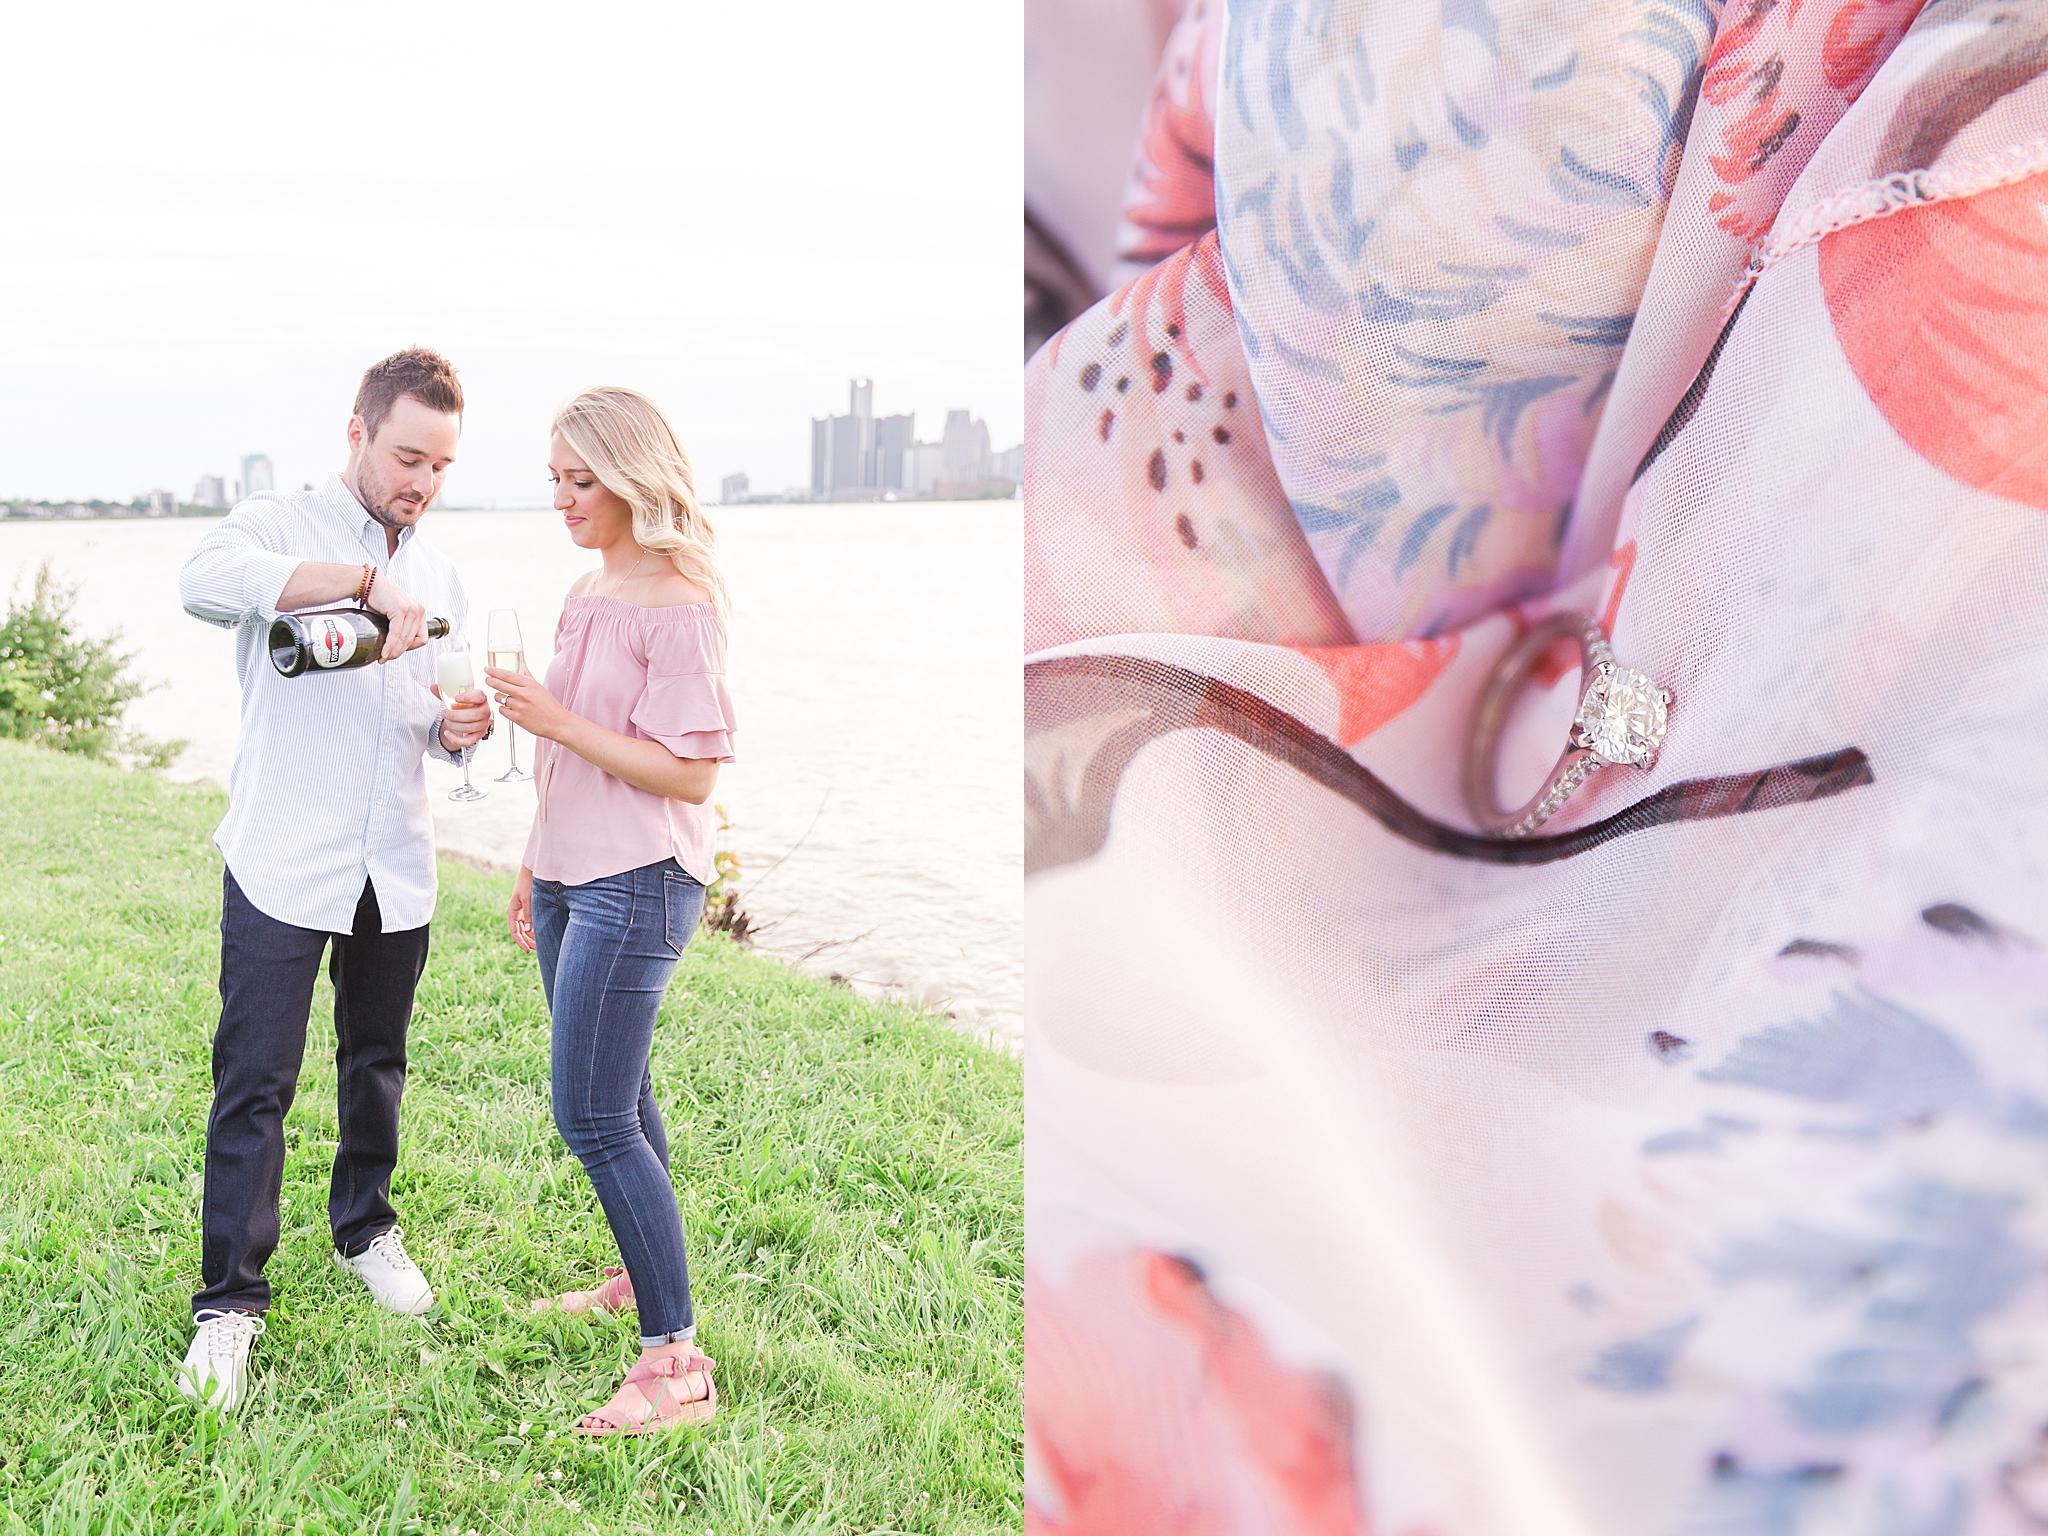 detroit-wedding-photographer-downtown-detroit-belle-isle-engagement-photos-sarah-eric-by-courtney-carolyn-photography_0043.jpg